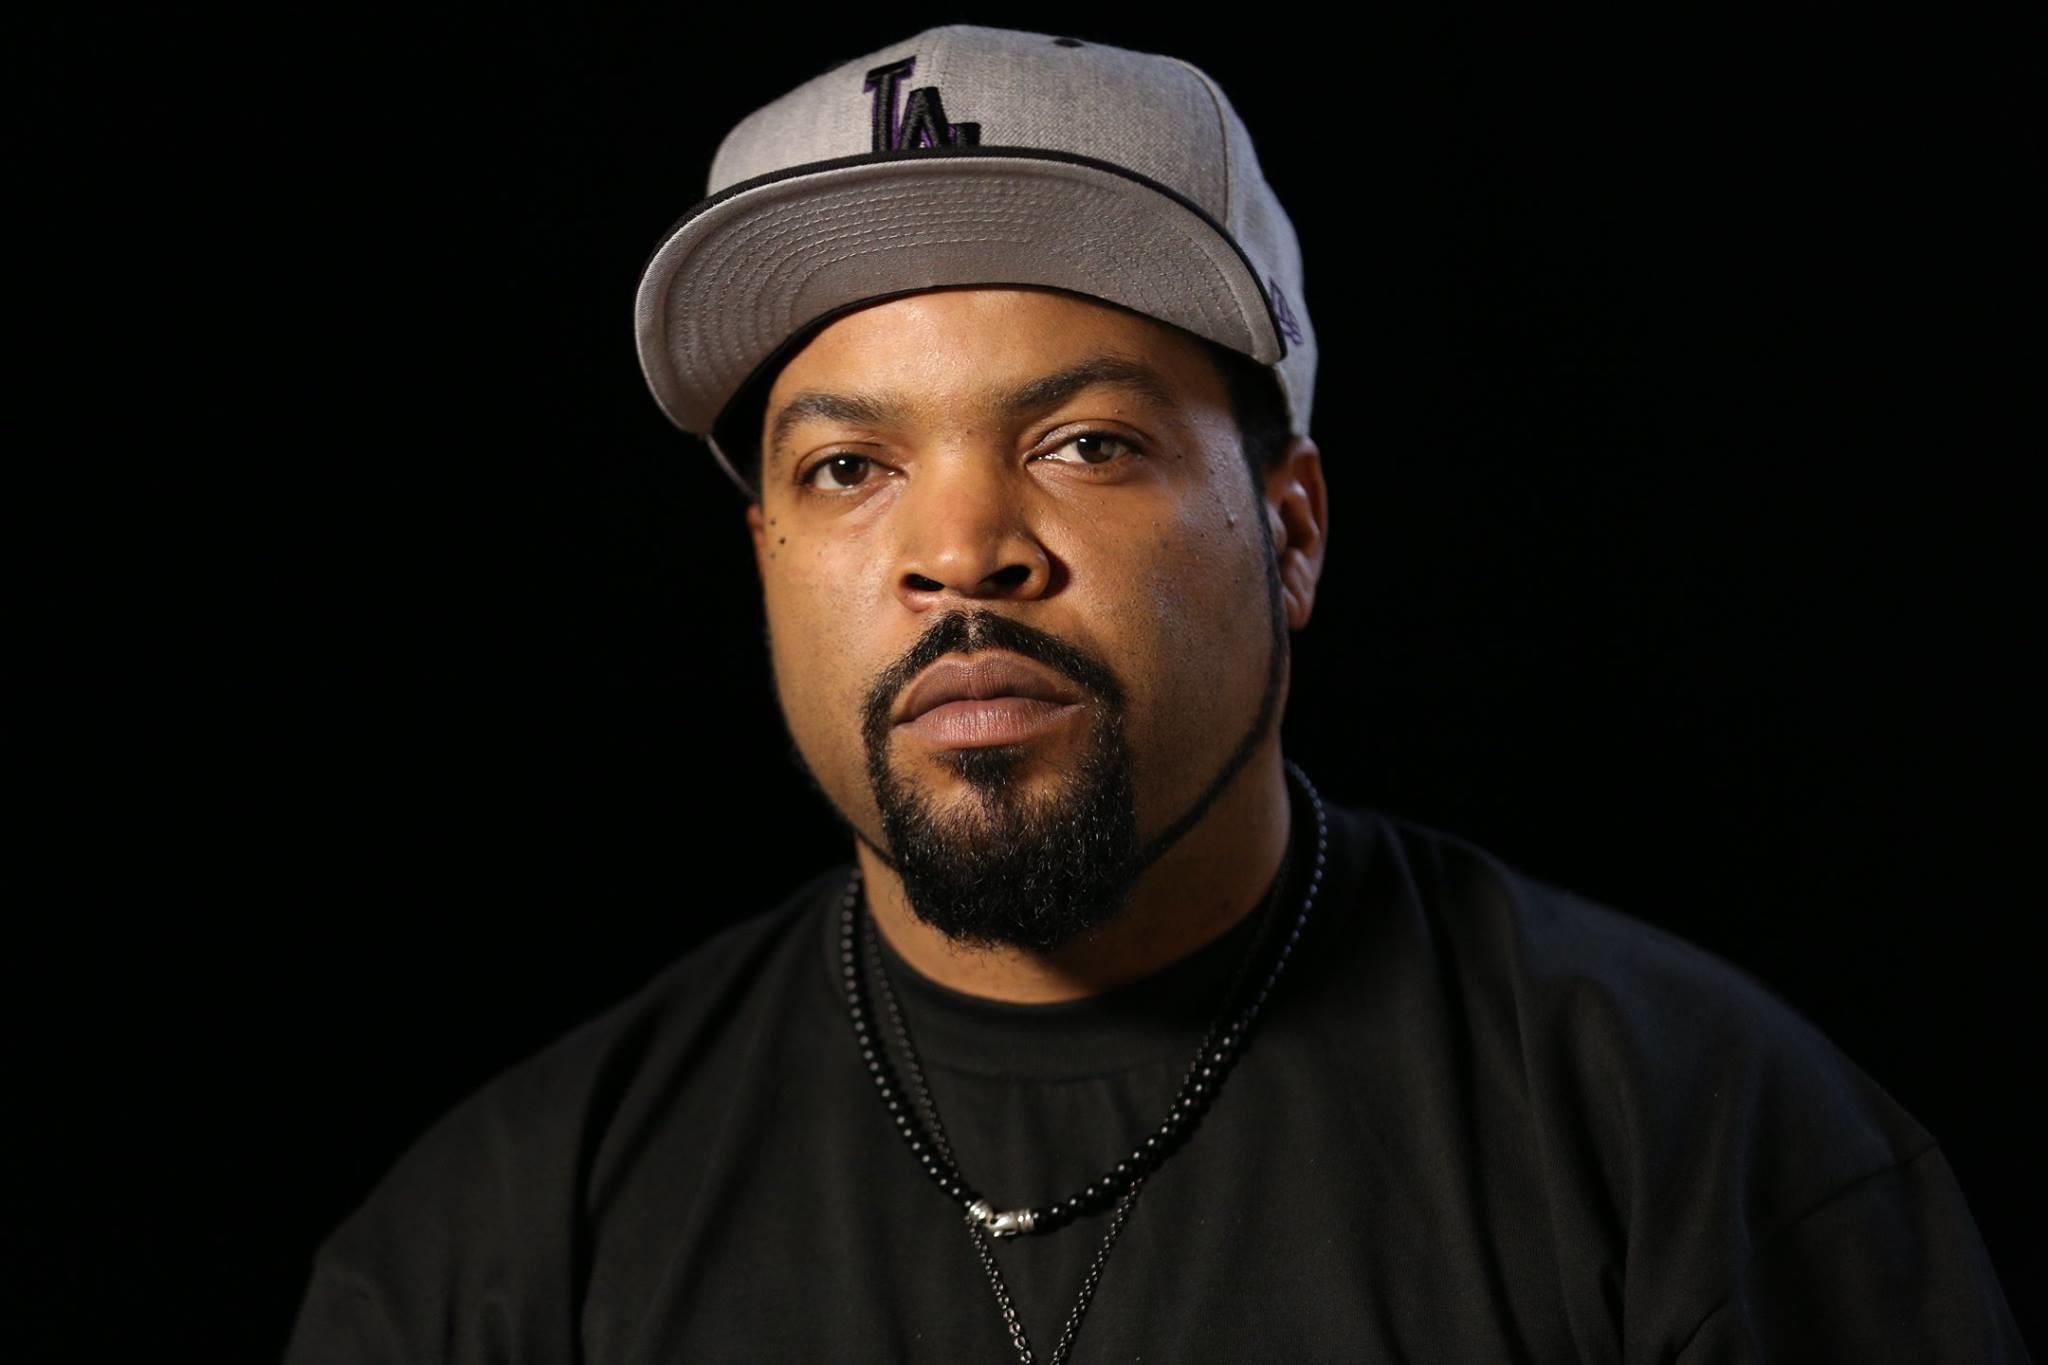 Ice Cube HD Desktop Wallpapers | 7wallpapers.net